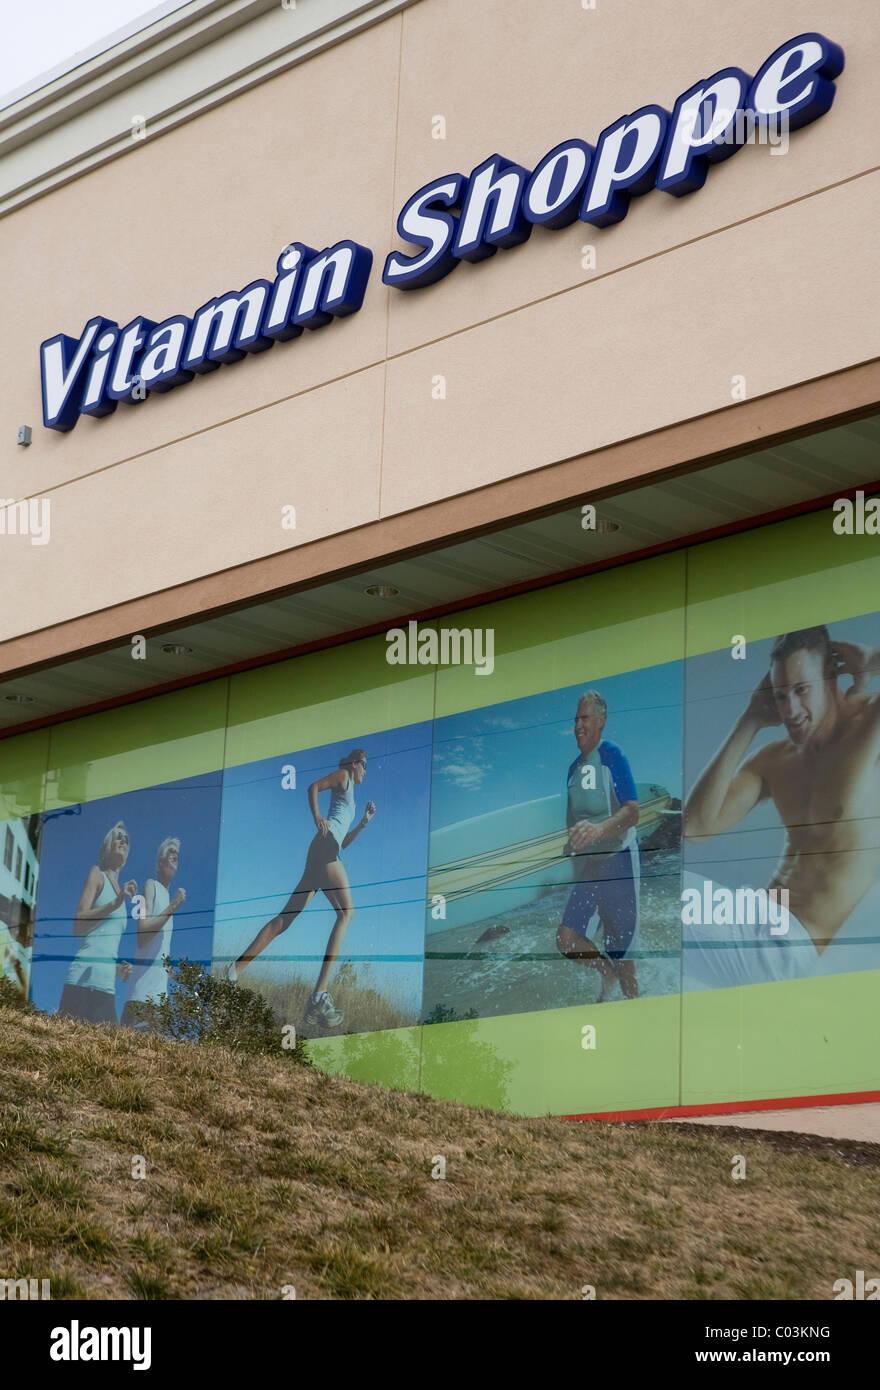 A Vitamin Shoppe retail store.  - Stock Image